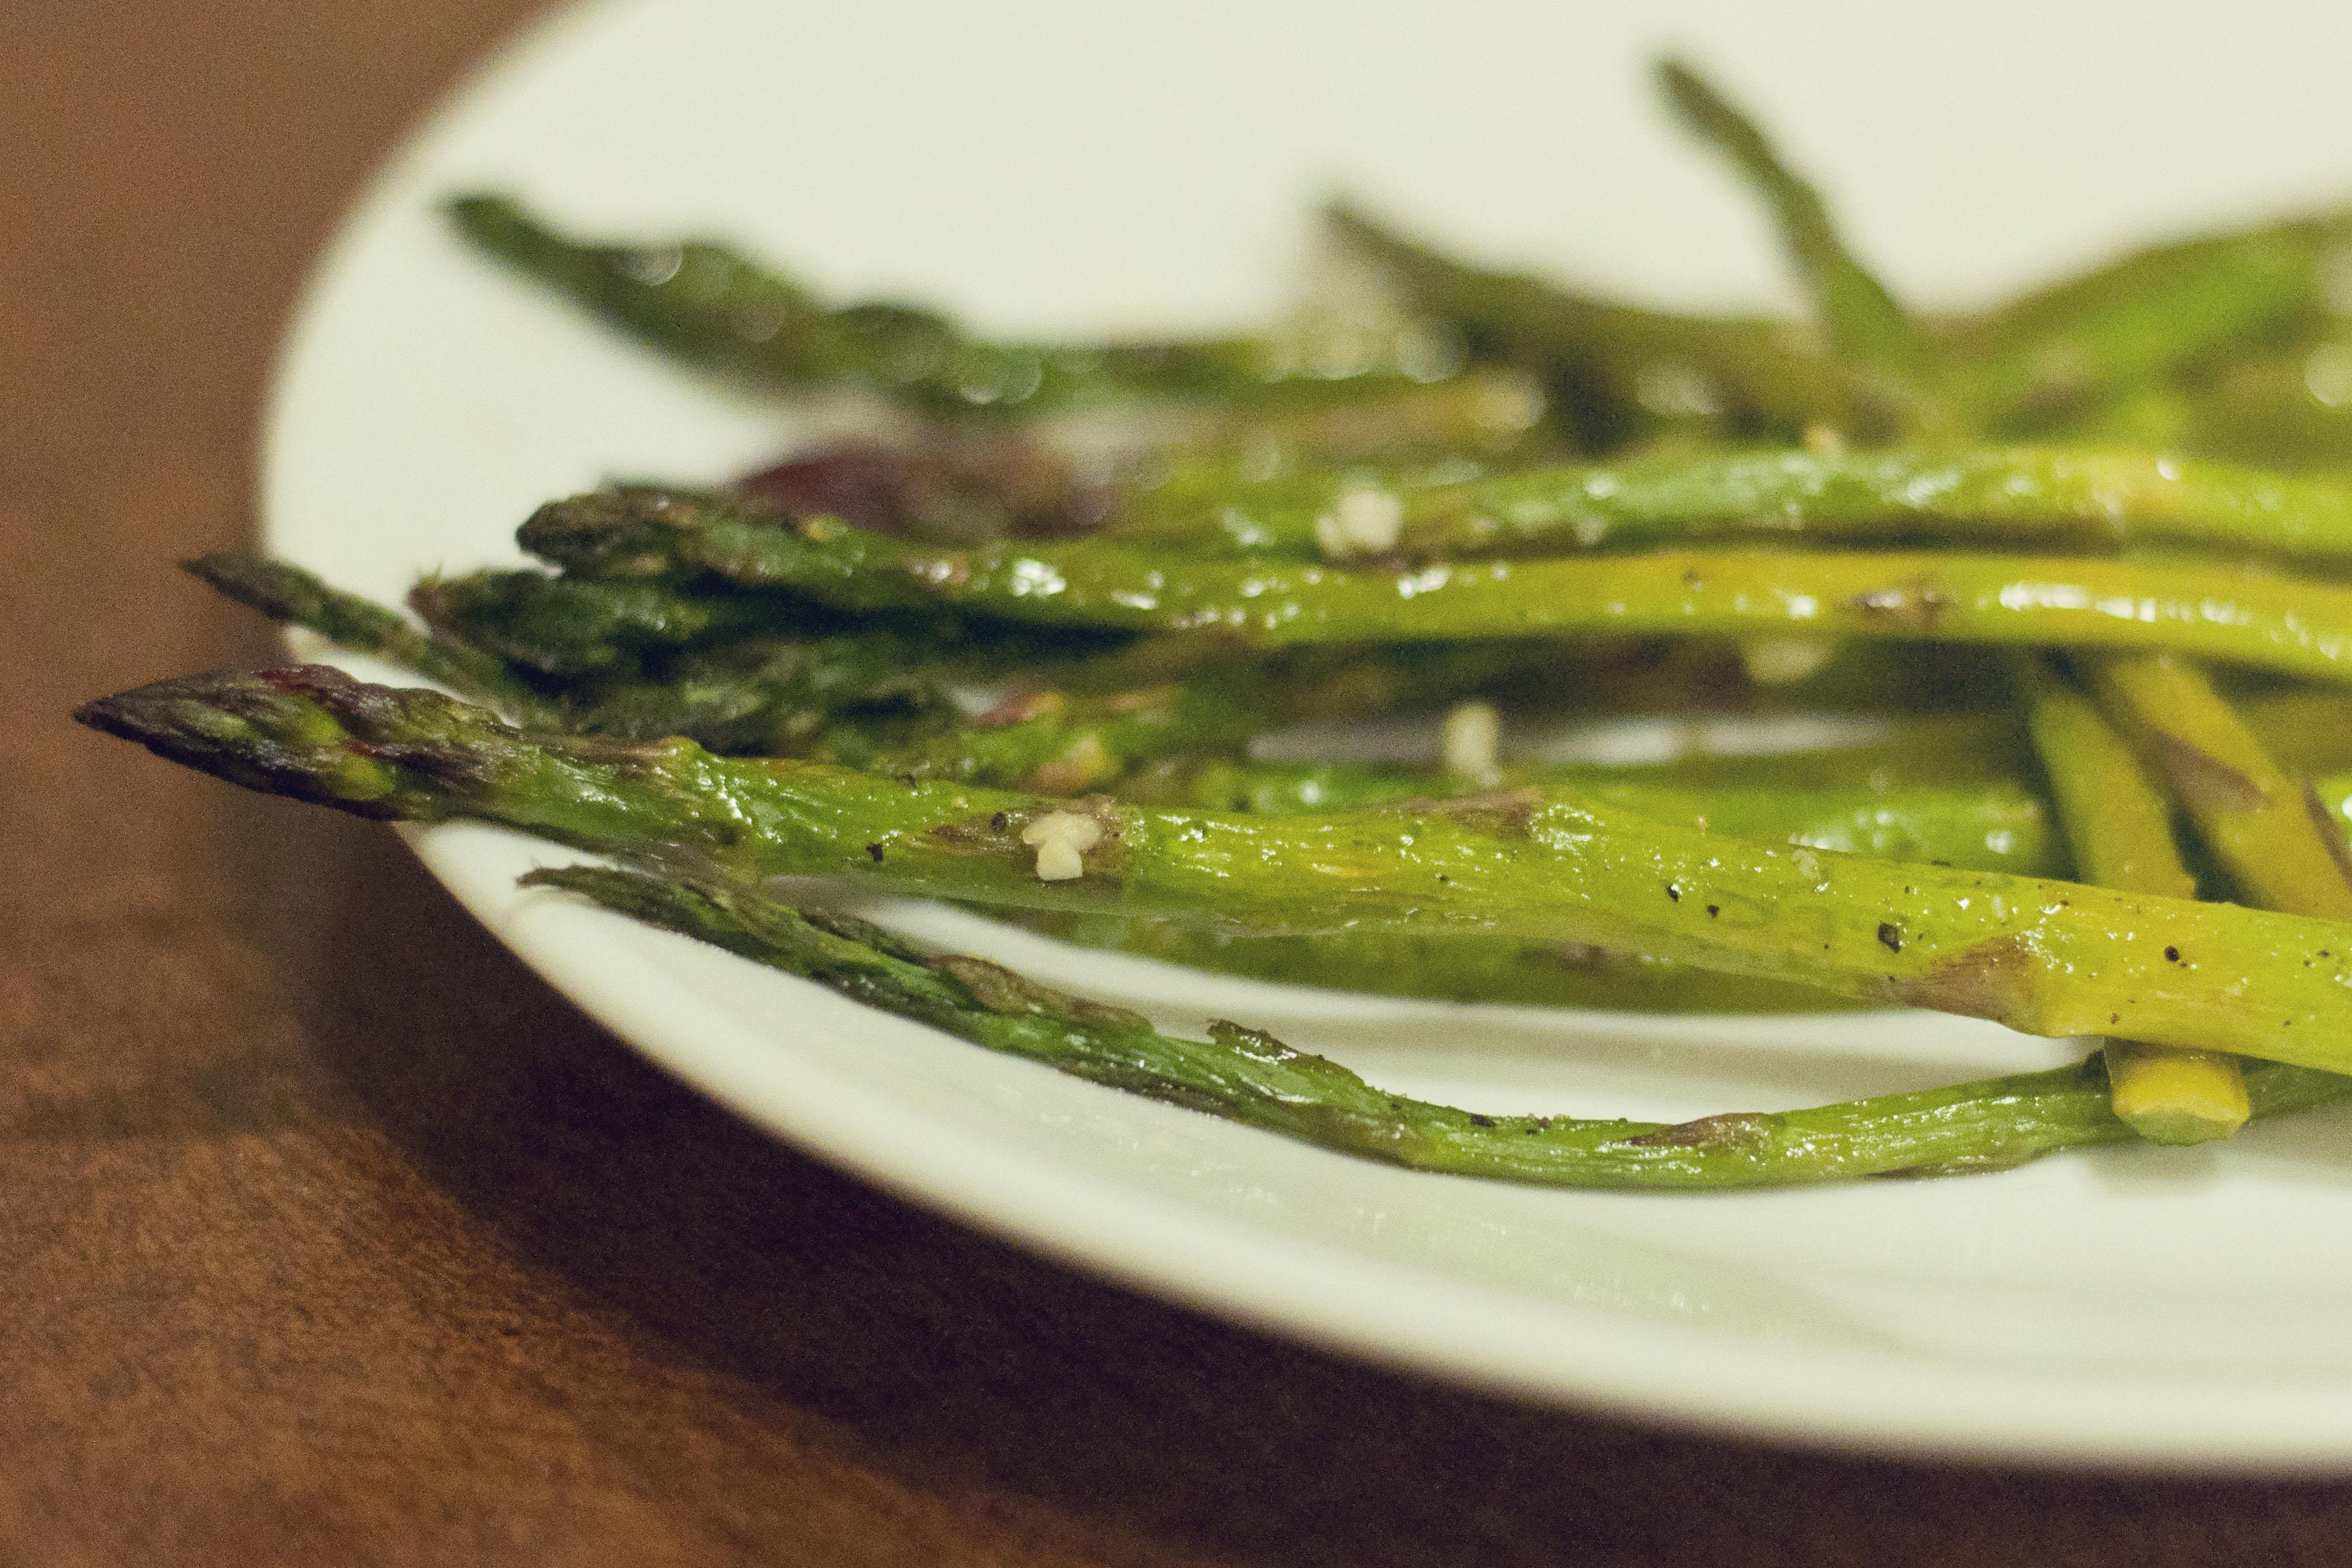 roasted asparagus recipe, easy roasted asparagus, delicious asparagus recipe, easy asparagus recipe, tasty asparagus recipe, tender asparagus recipe, asparagus in the oven, how to cook asparagus in the oven, recipes, cooking, food, taste arkansas, dinner